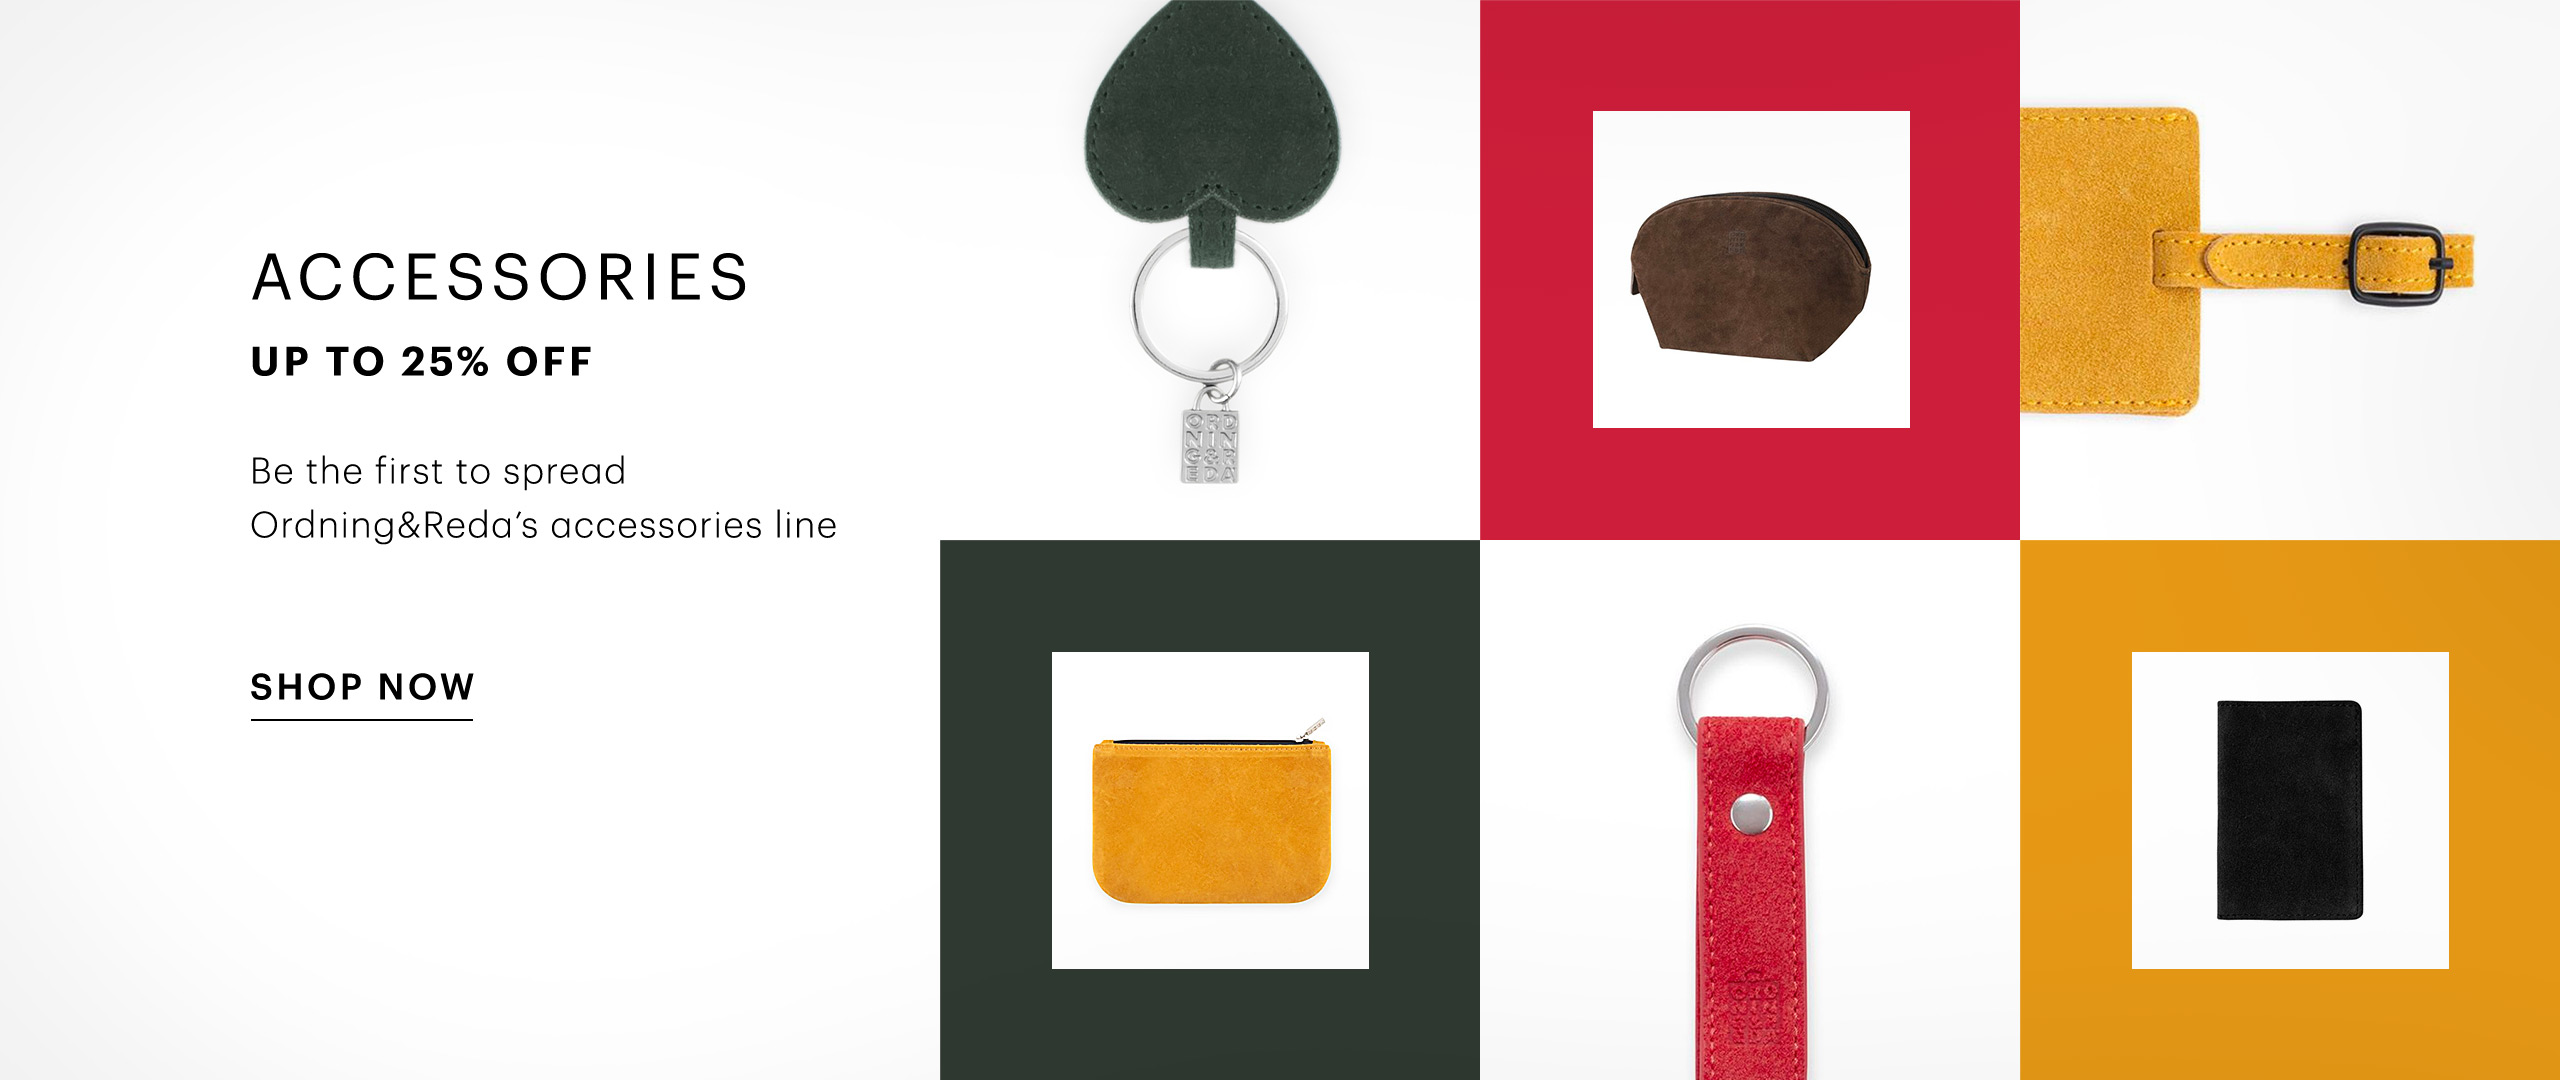 [OR] Accessories EN